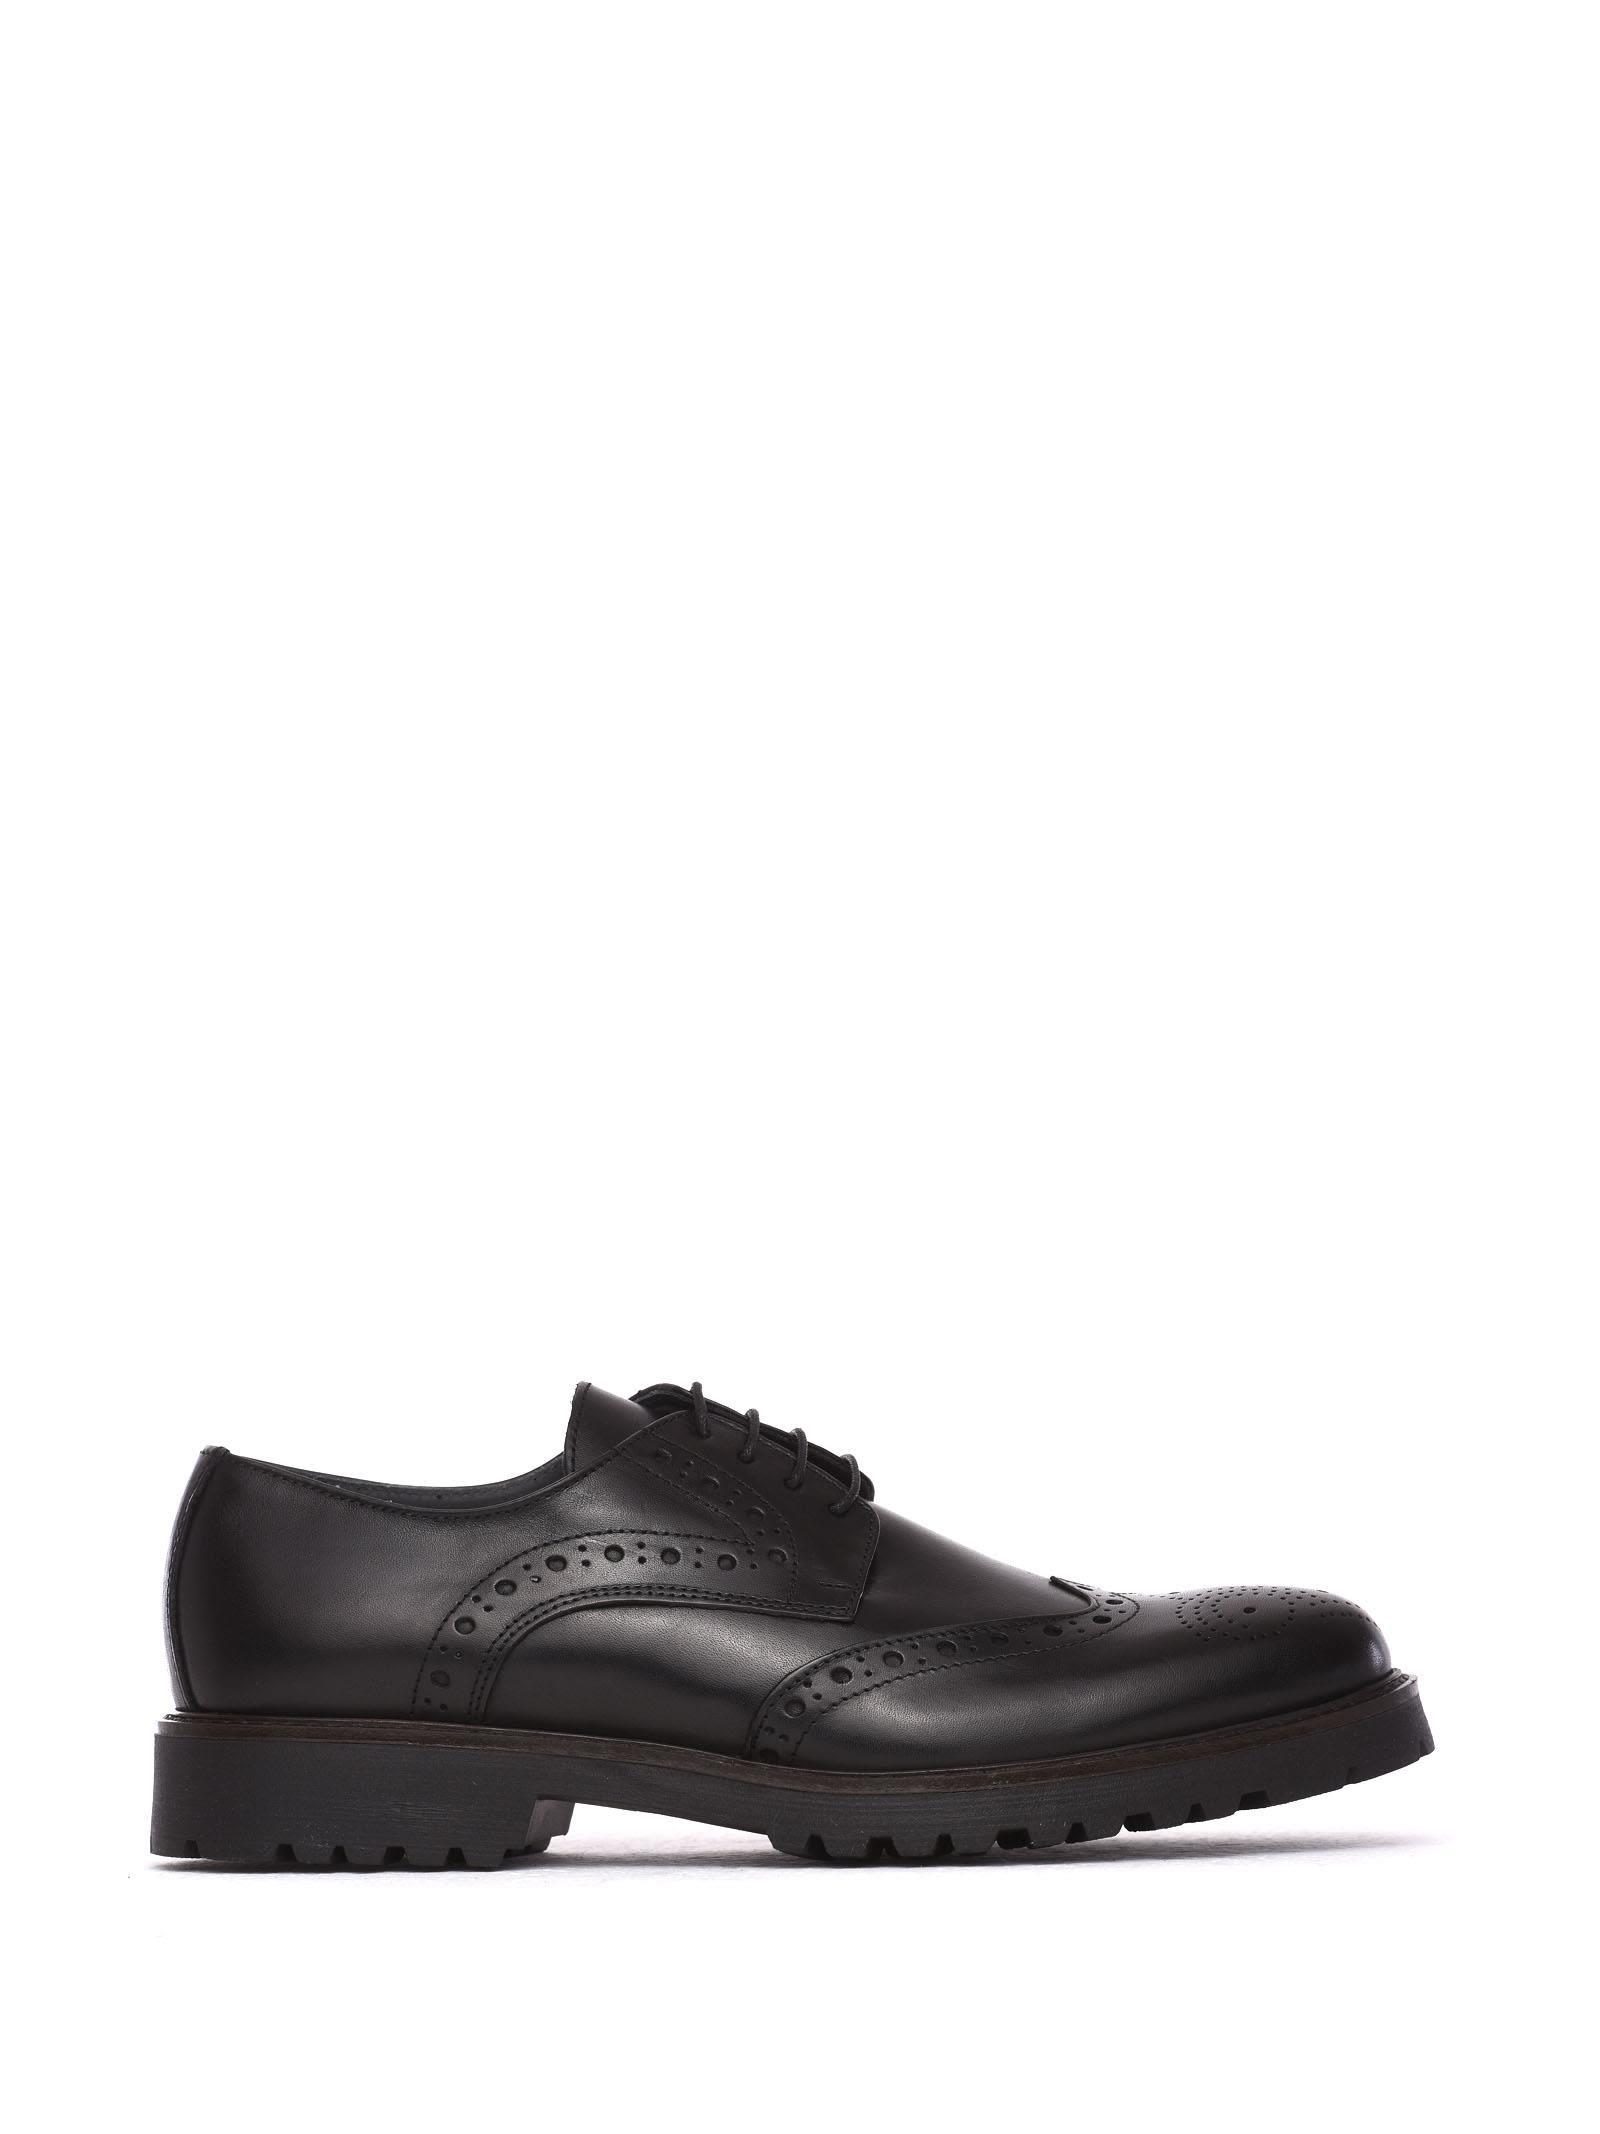 Pollini Duilio Black Leather Lace-up Shoes